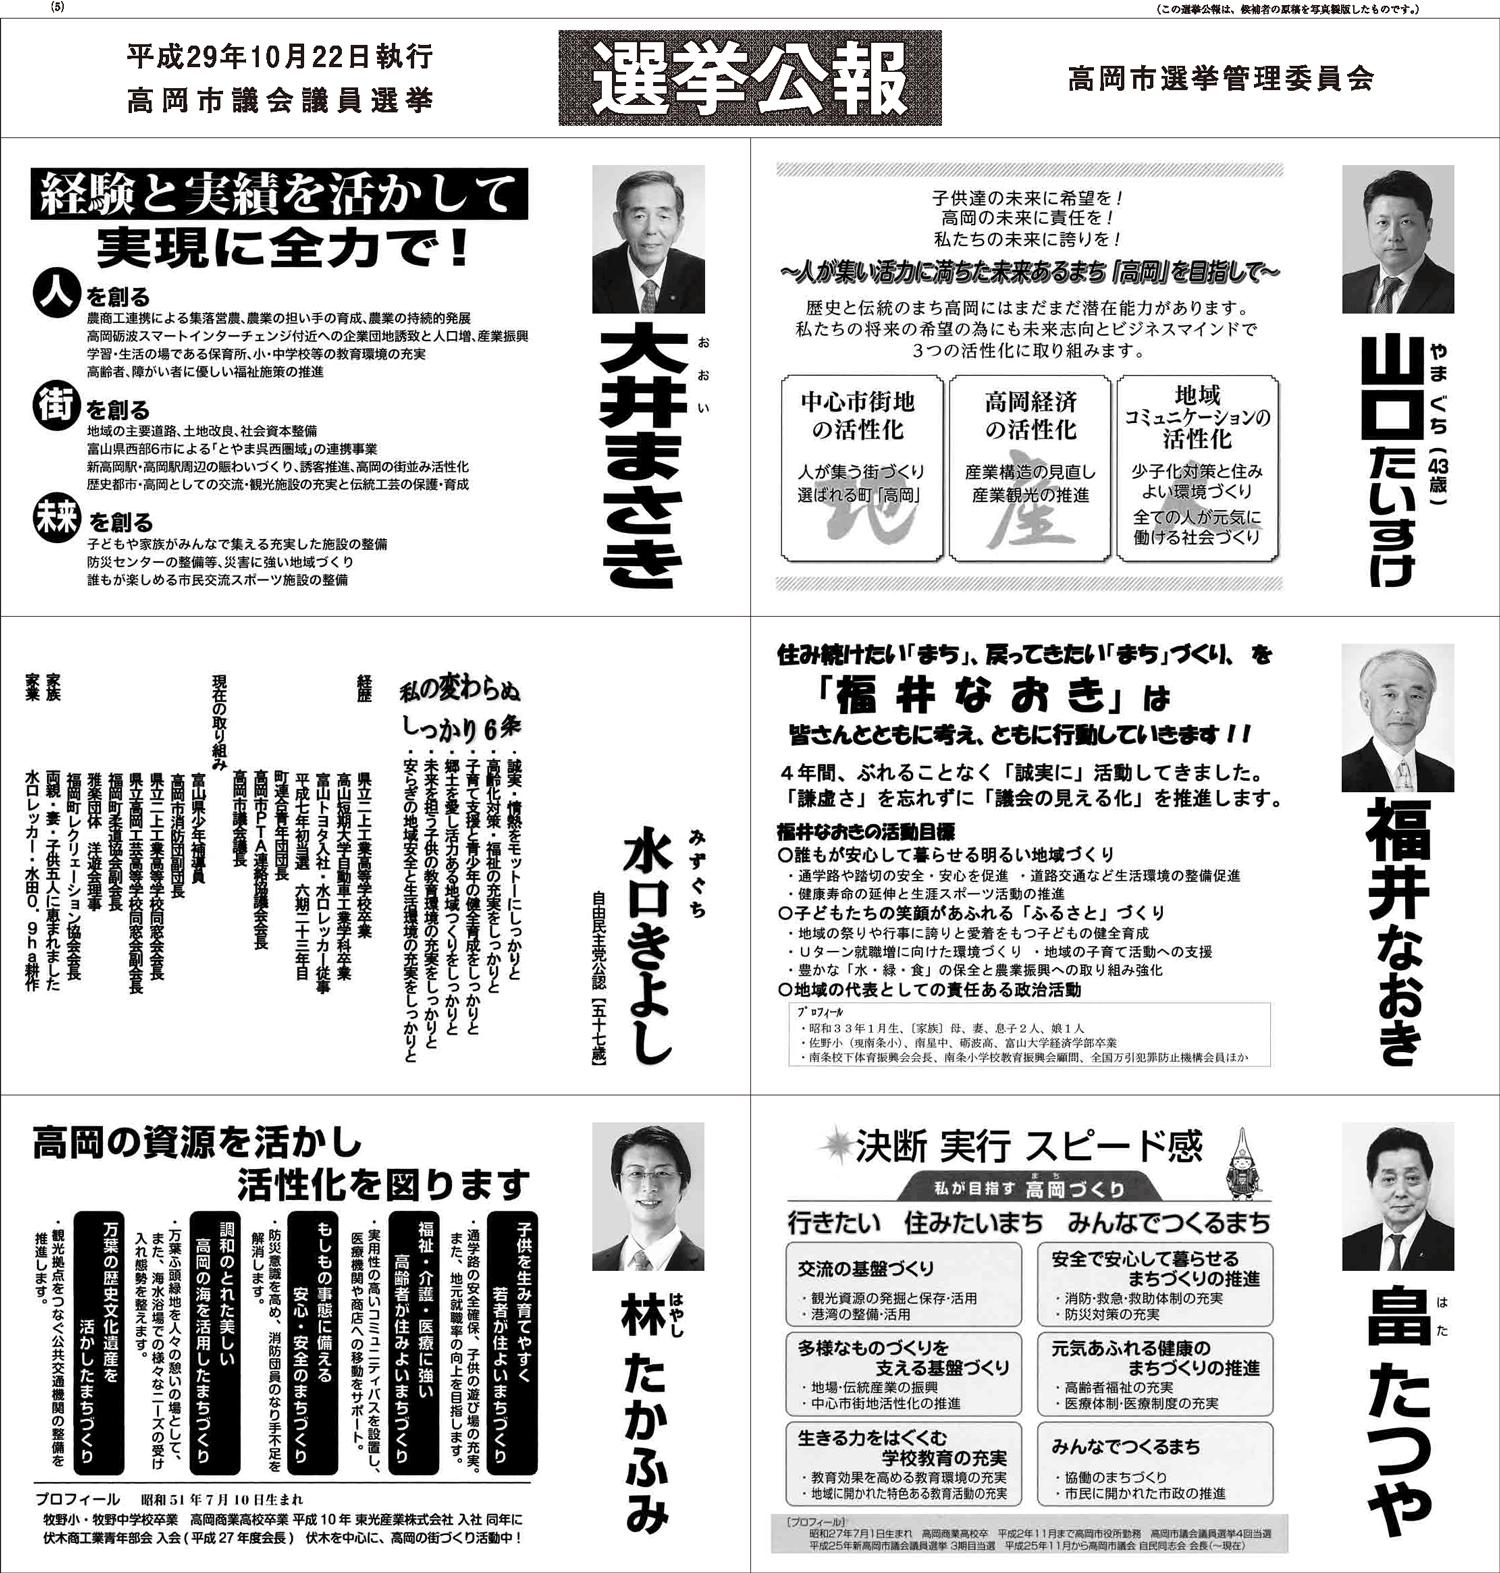 高岡市議会議員選挙2017の選挙公報5